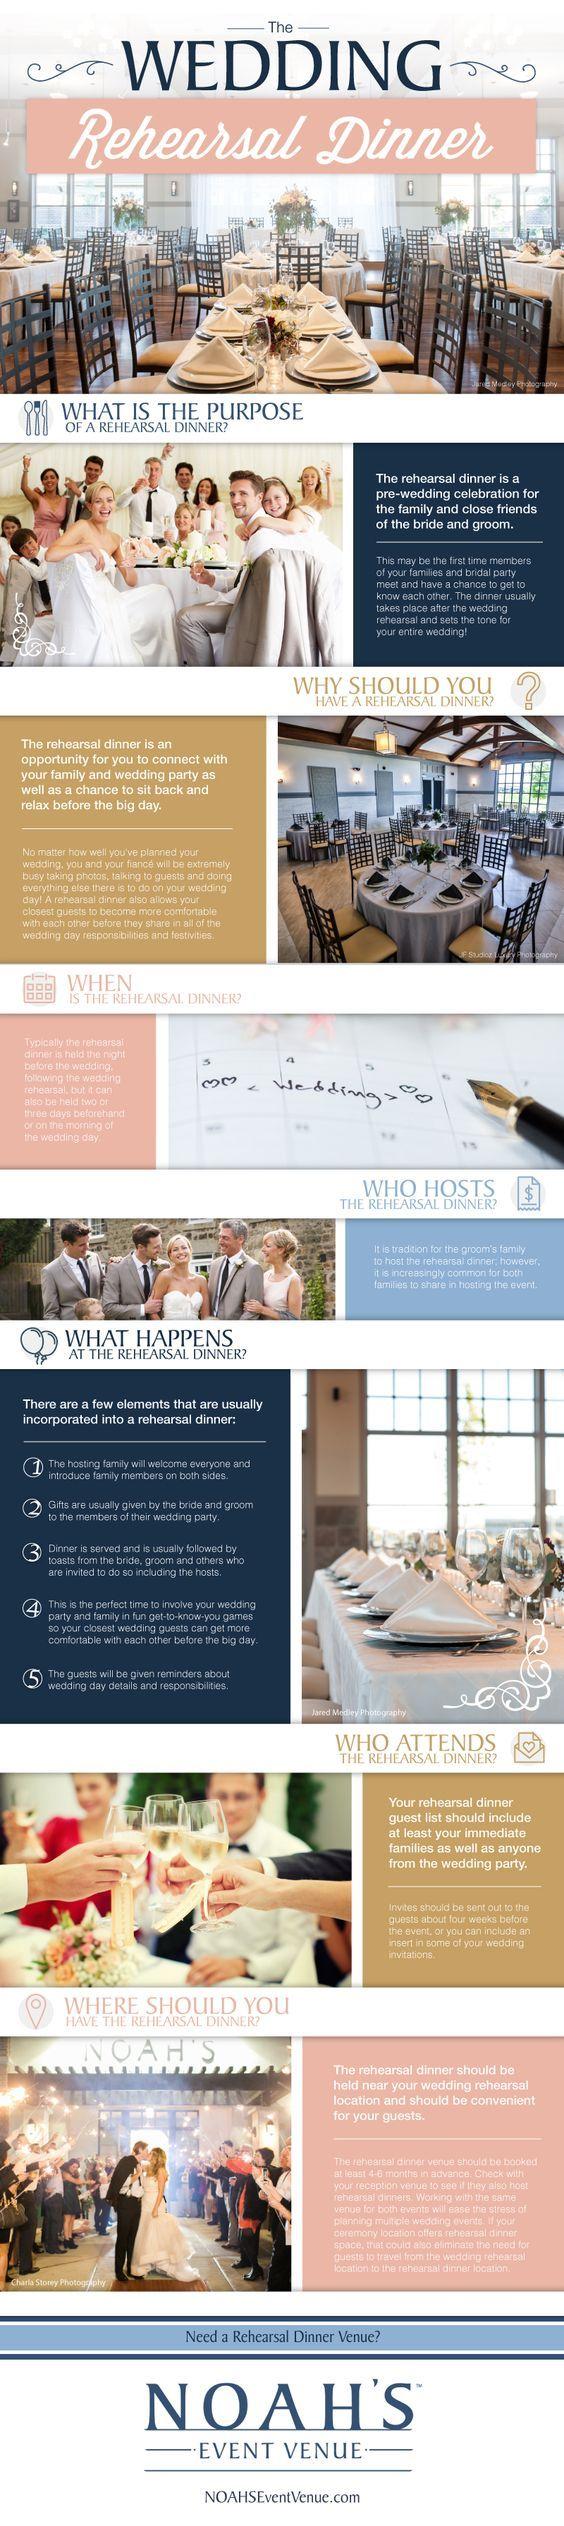 The Wedding Rehearsal Dinner | NOAH'S Weddings Blog | www.NOAHSWeddings.com